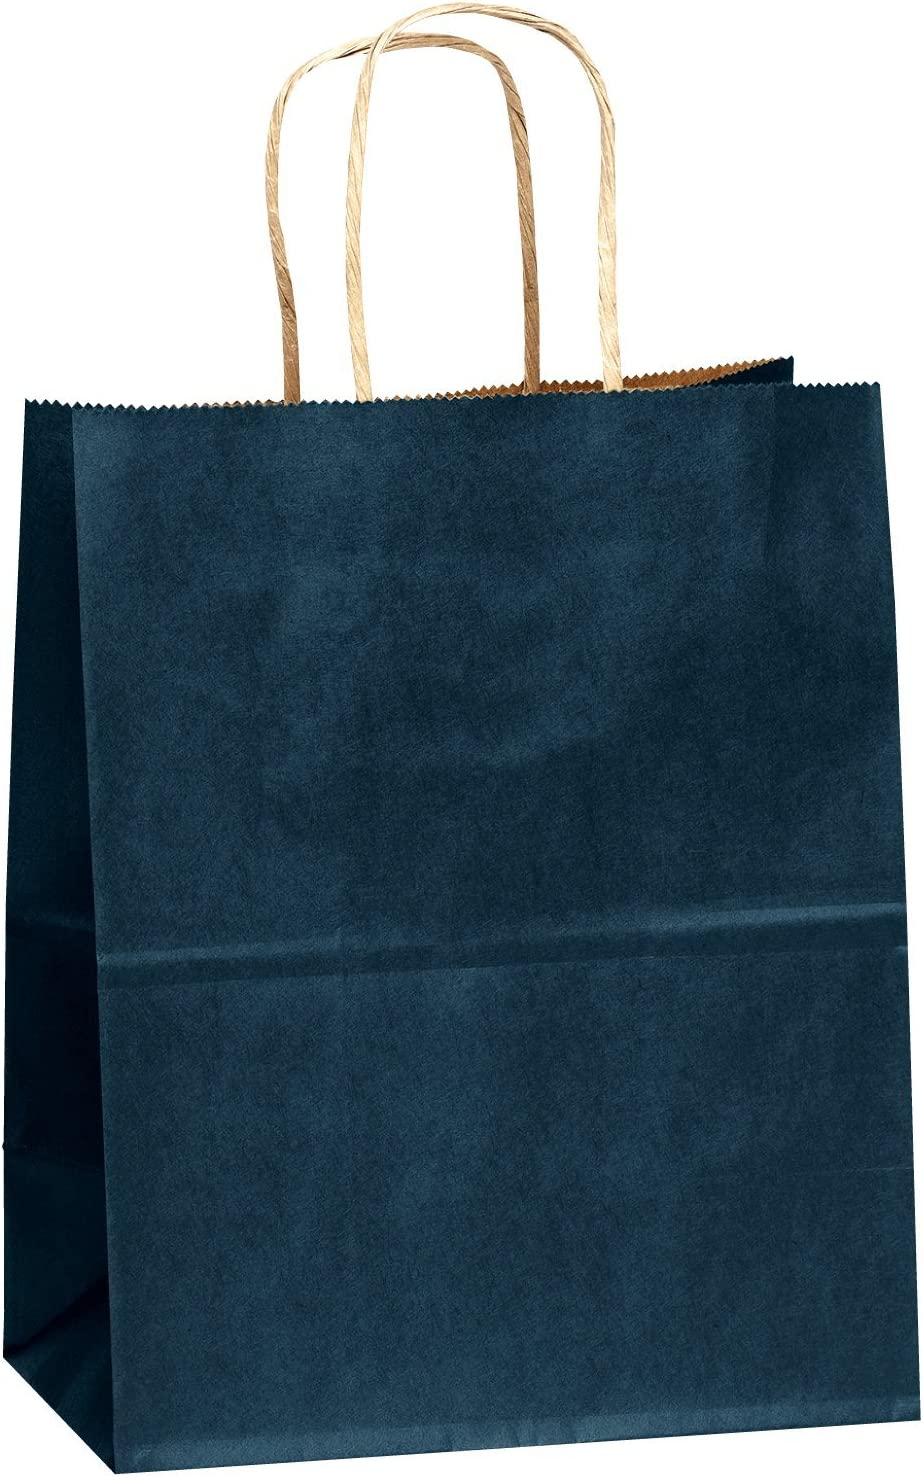 Flexicore Packaging Navy Blue Kraft Paper Bags Size 100 Bags Count 8 Inch X 4.75 Inch x 10.25 Inch Navy Blue Color